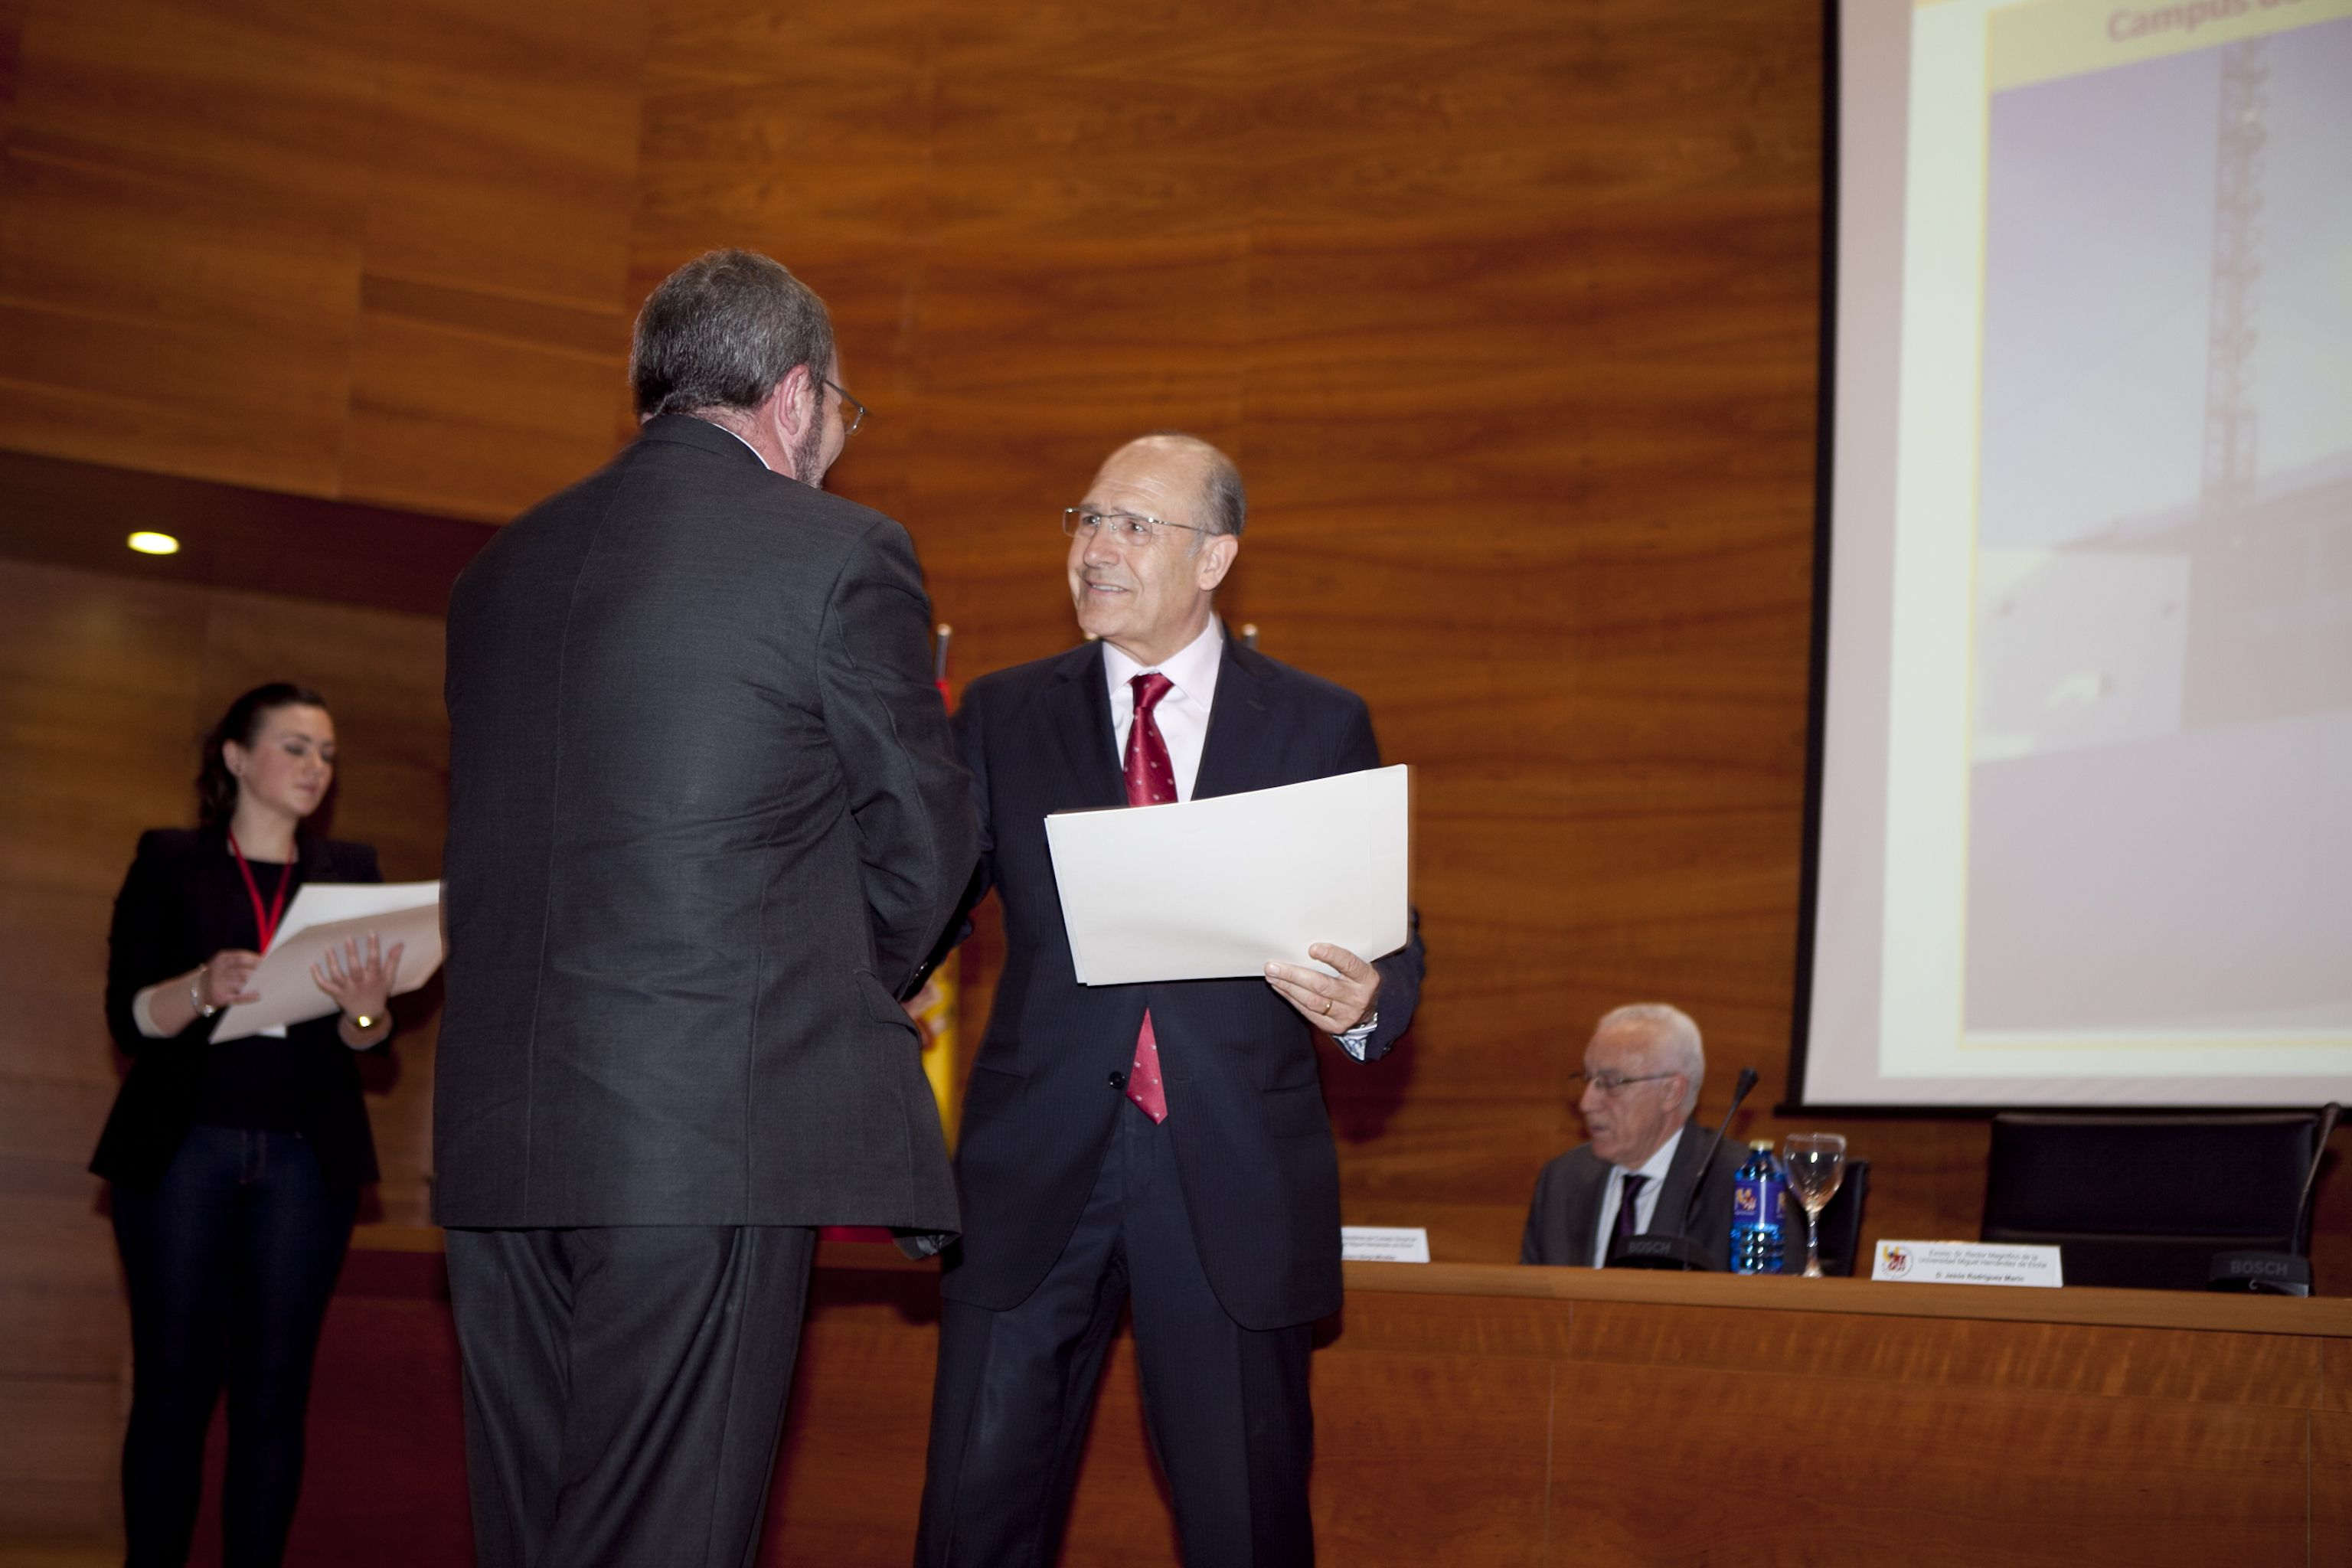 umh-diplomas-rector_mg_6500.jpg